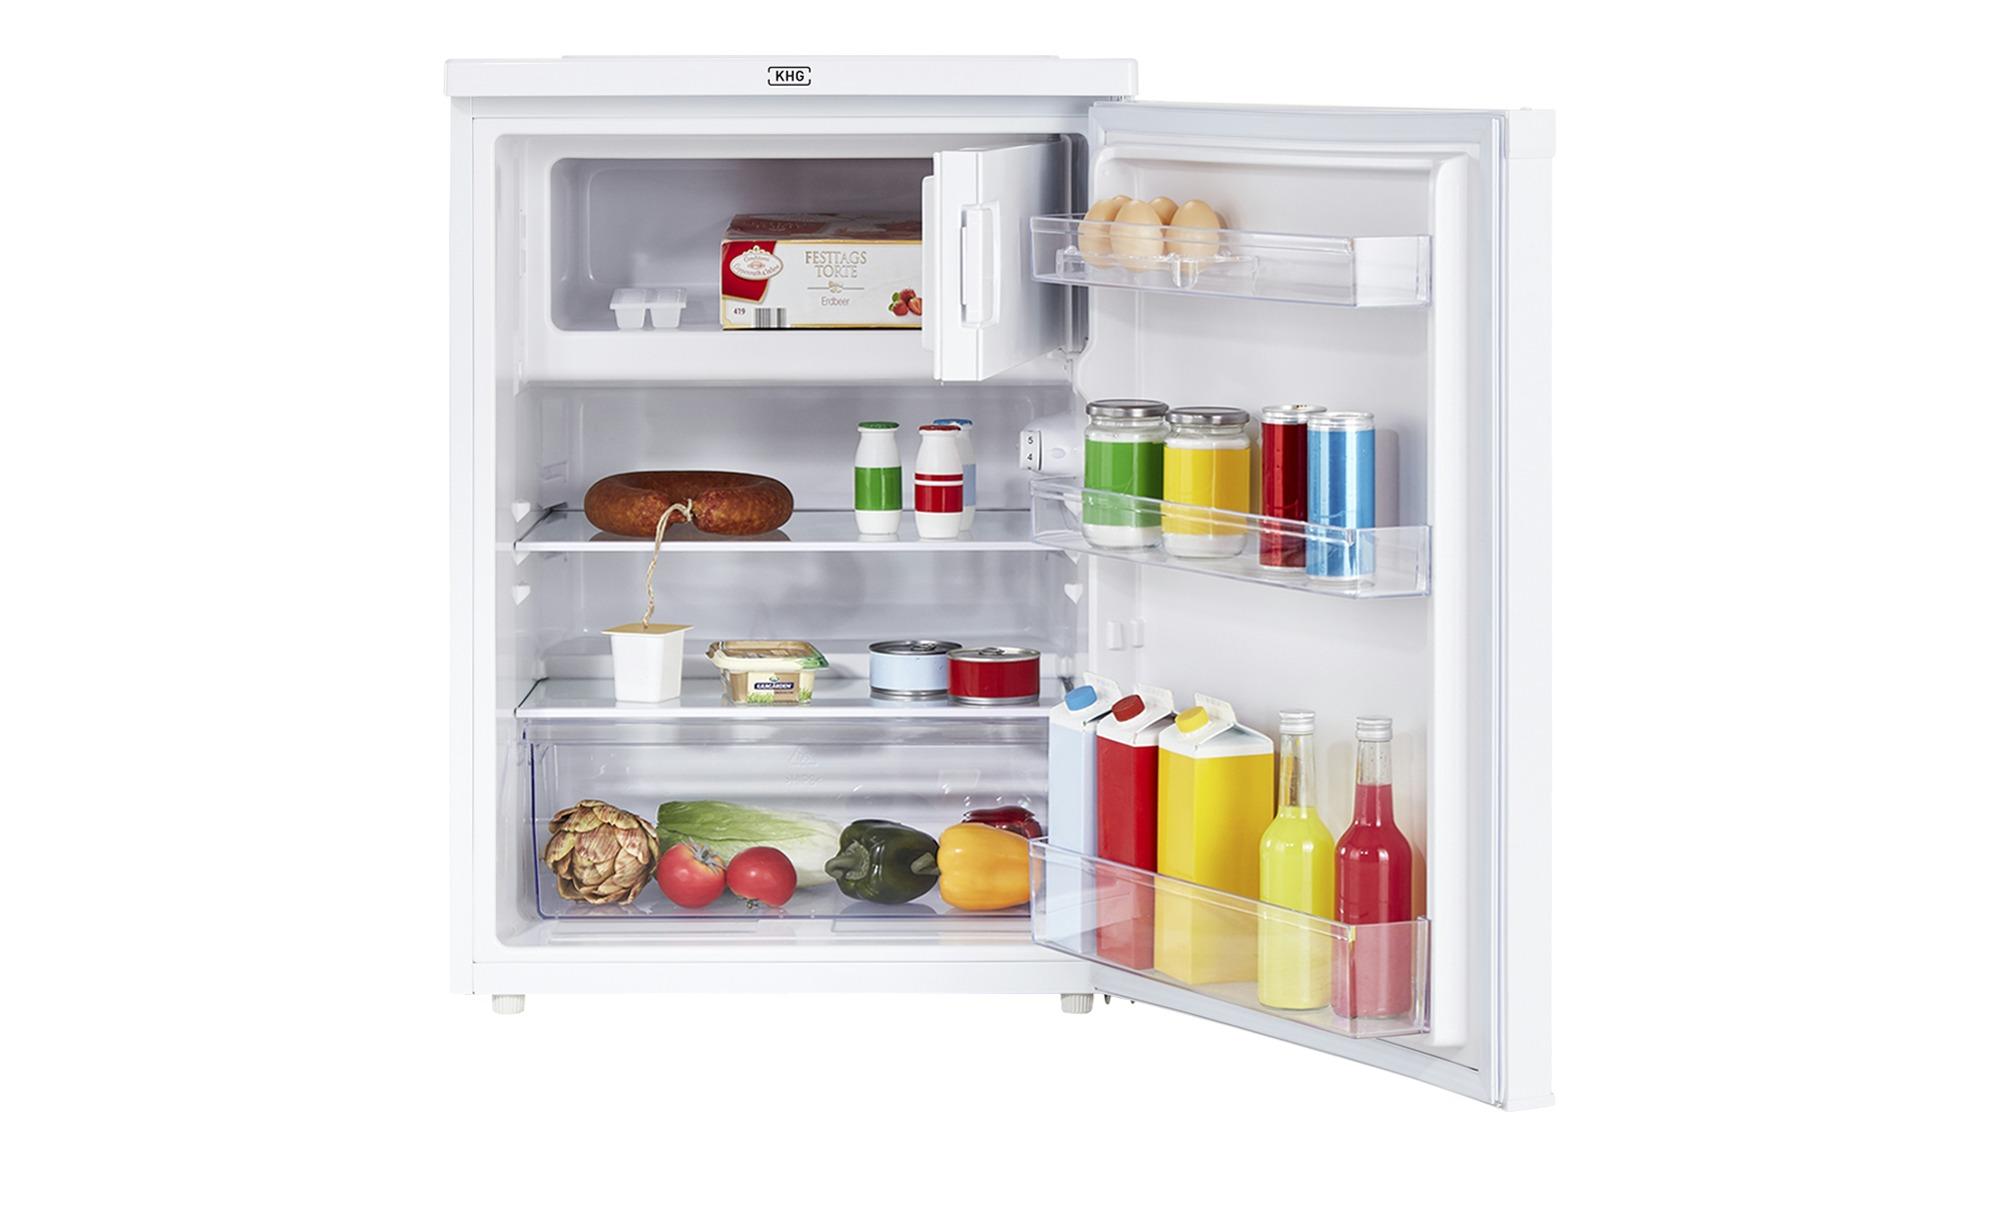 Gorenje Kühlschrank Alarm : Khg kühlschrank ks mg w bei möbel kraft online kaufen